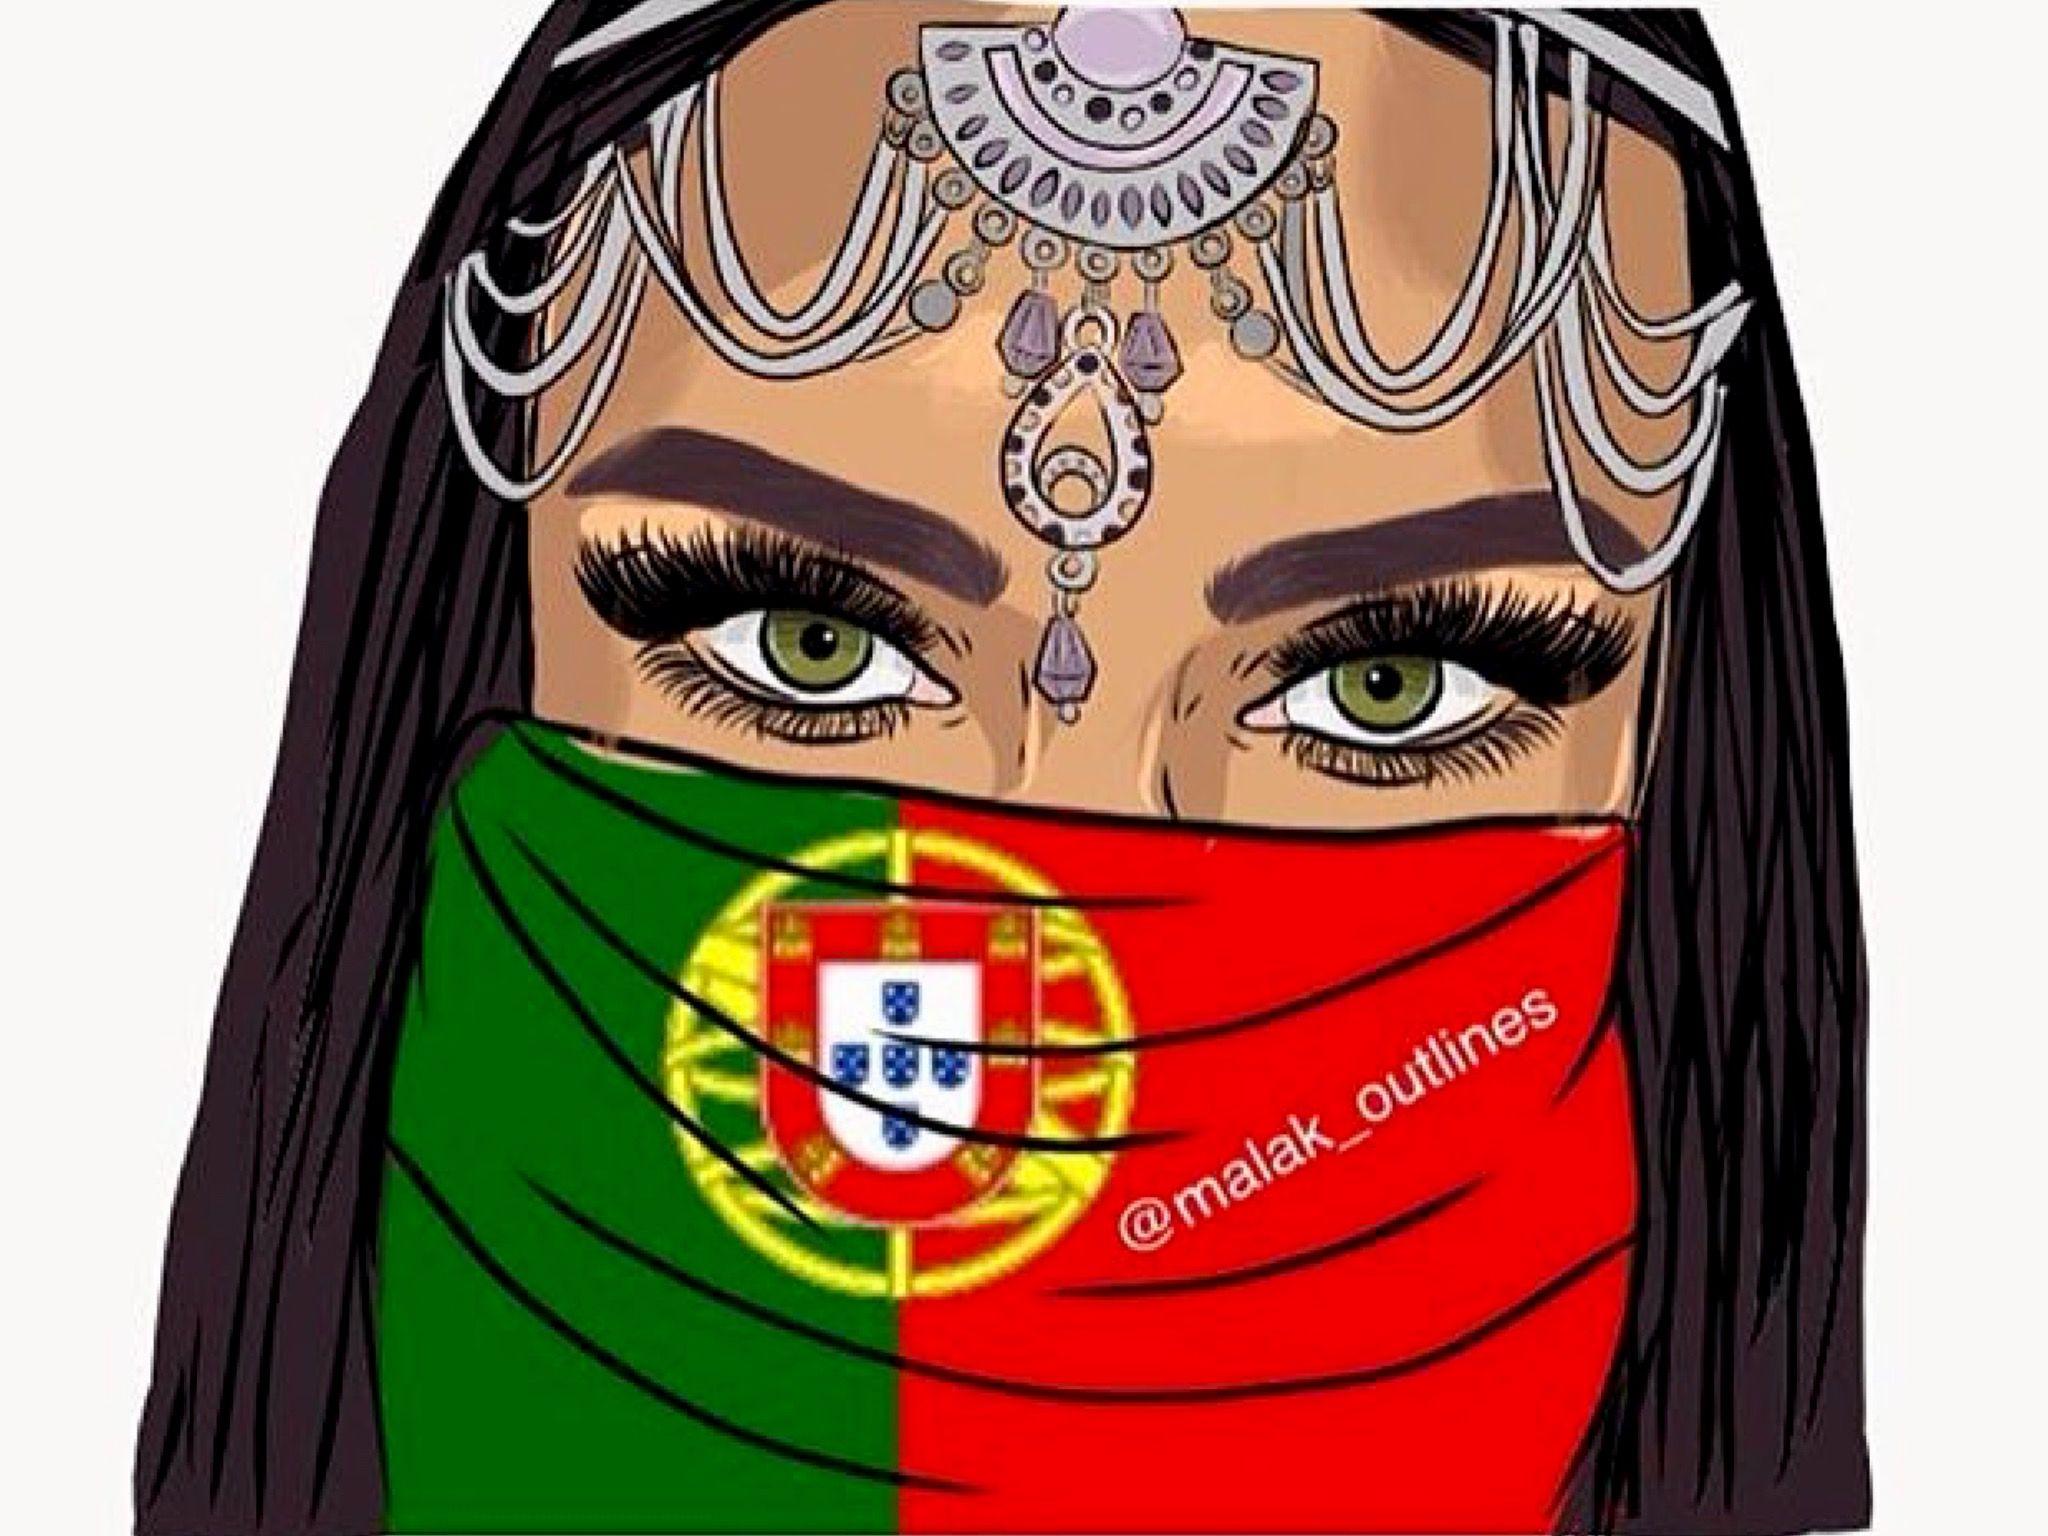 Lopes margueritte portugal no cora o en 2018 pinterest tunisie dessin et maroc - Dessin drapeau portugal ...